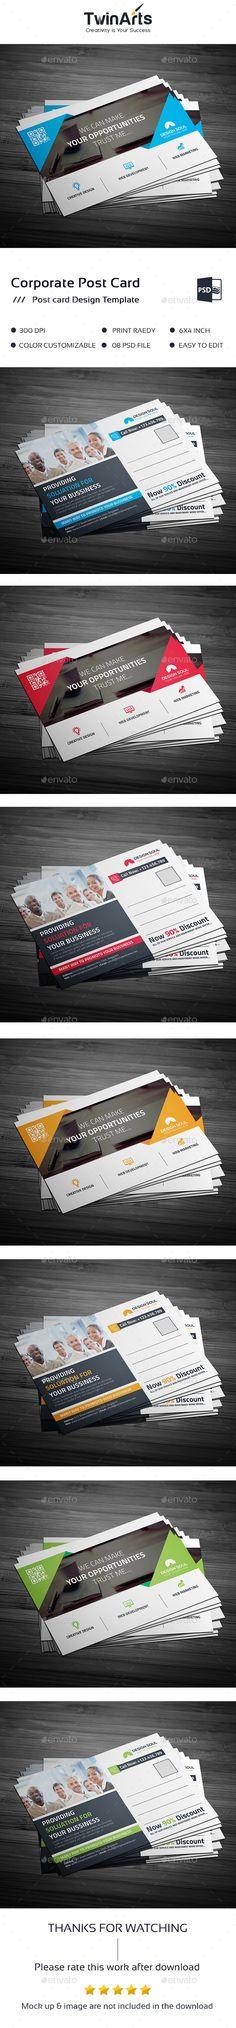 Postcard Design Template PSD